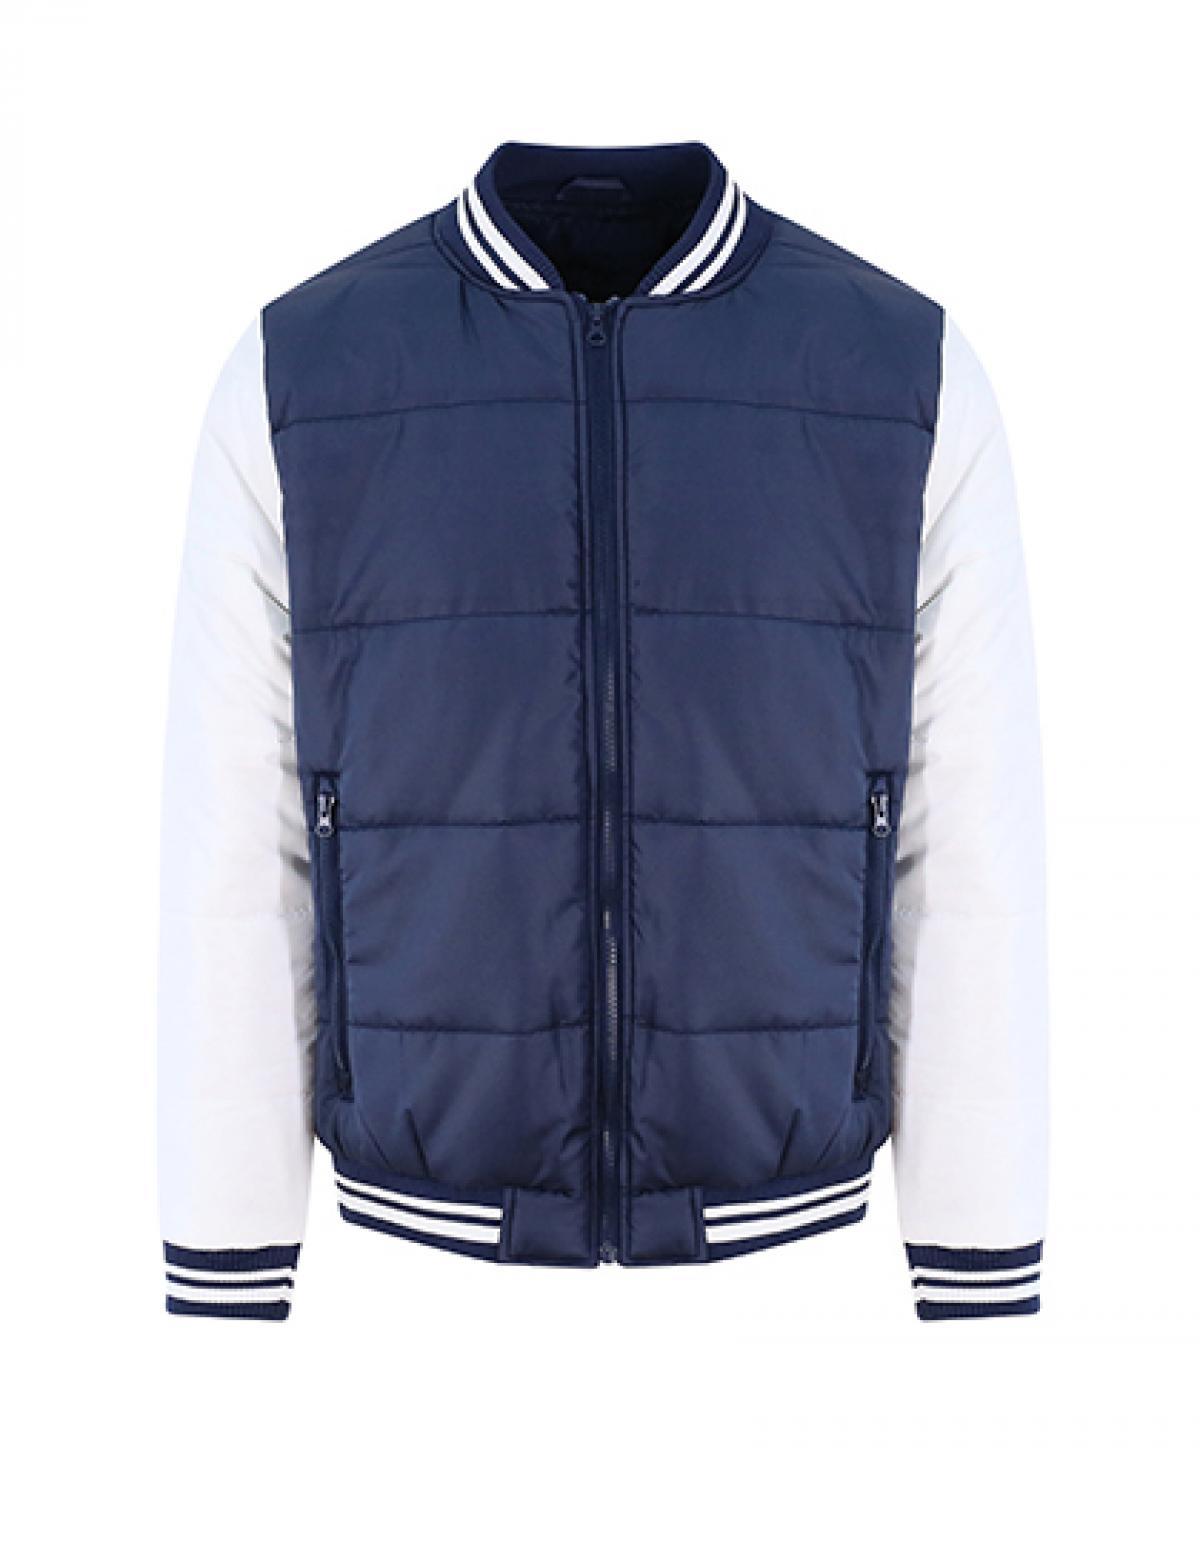 Herren Jacke Varsity Puffer Jacket Durchgehend gefüttert | JH049 | Just Hoods